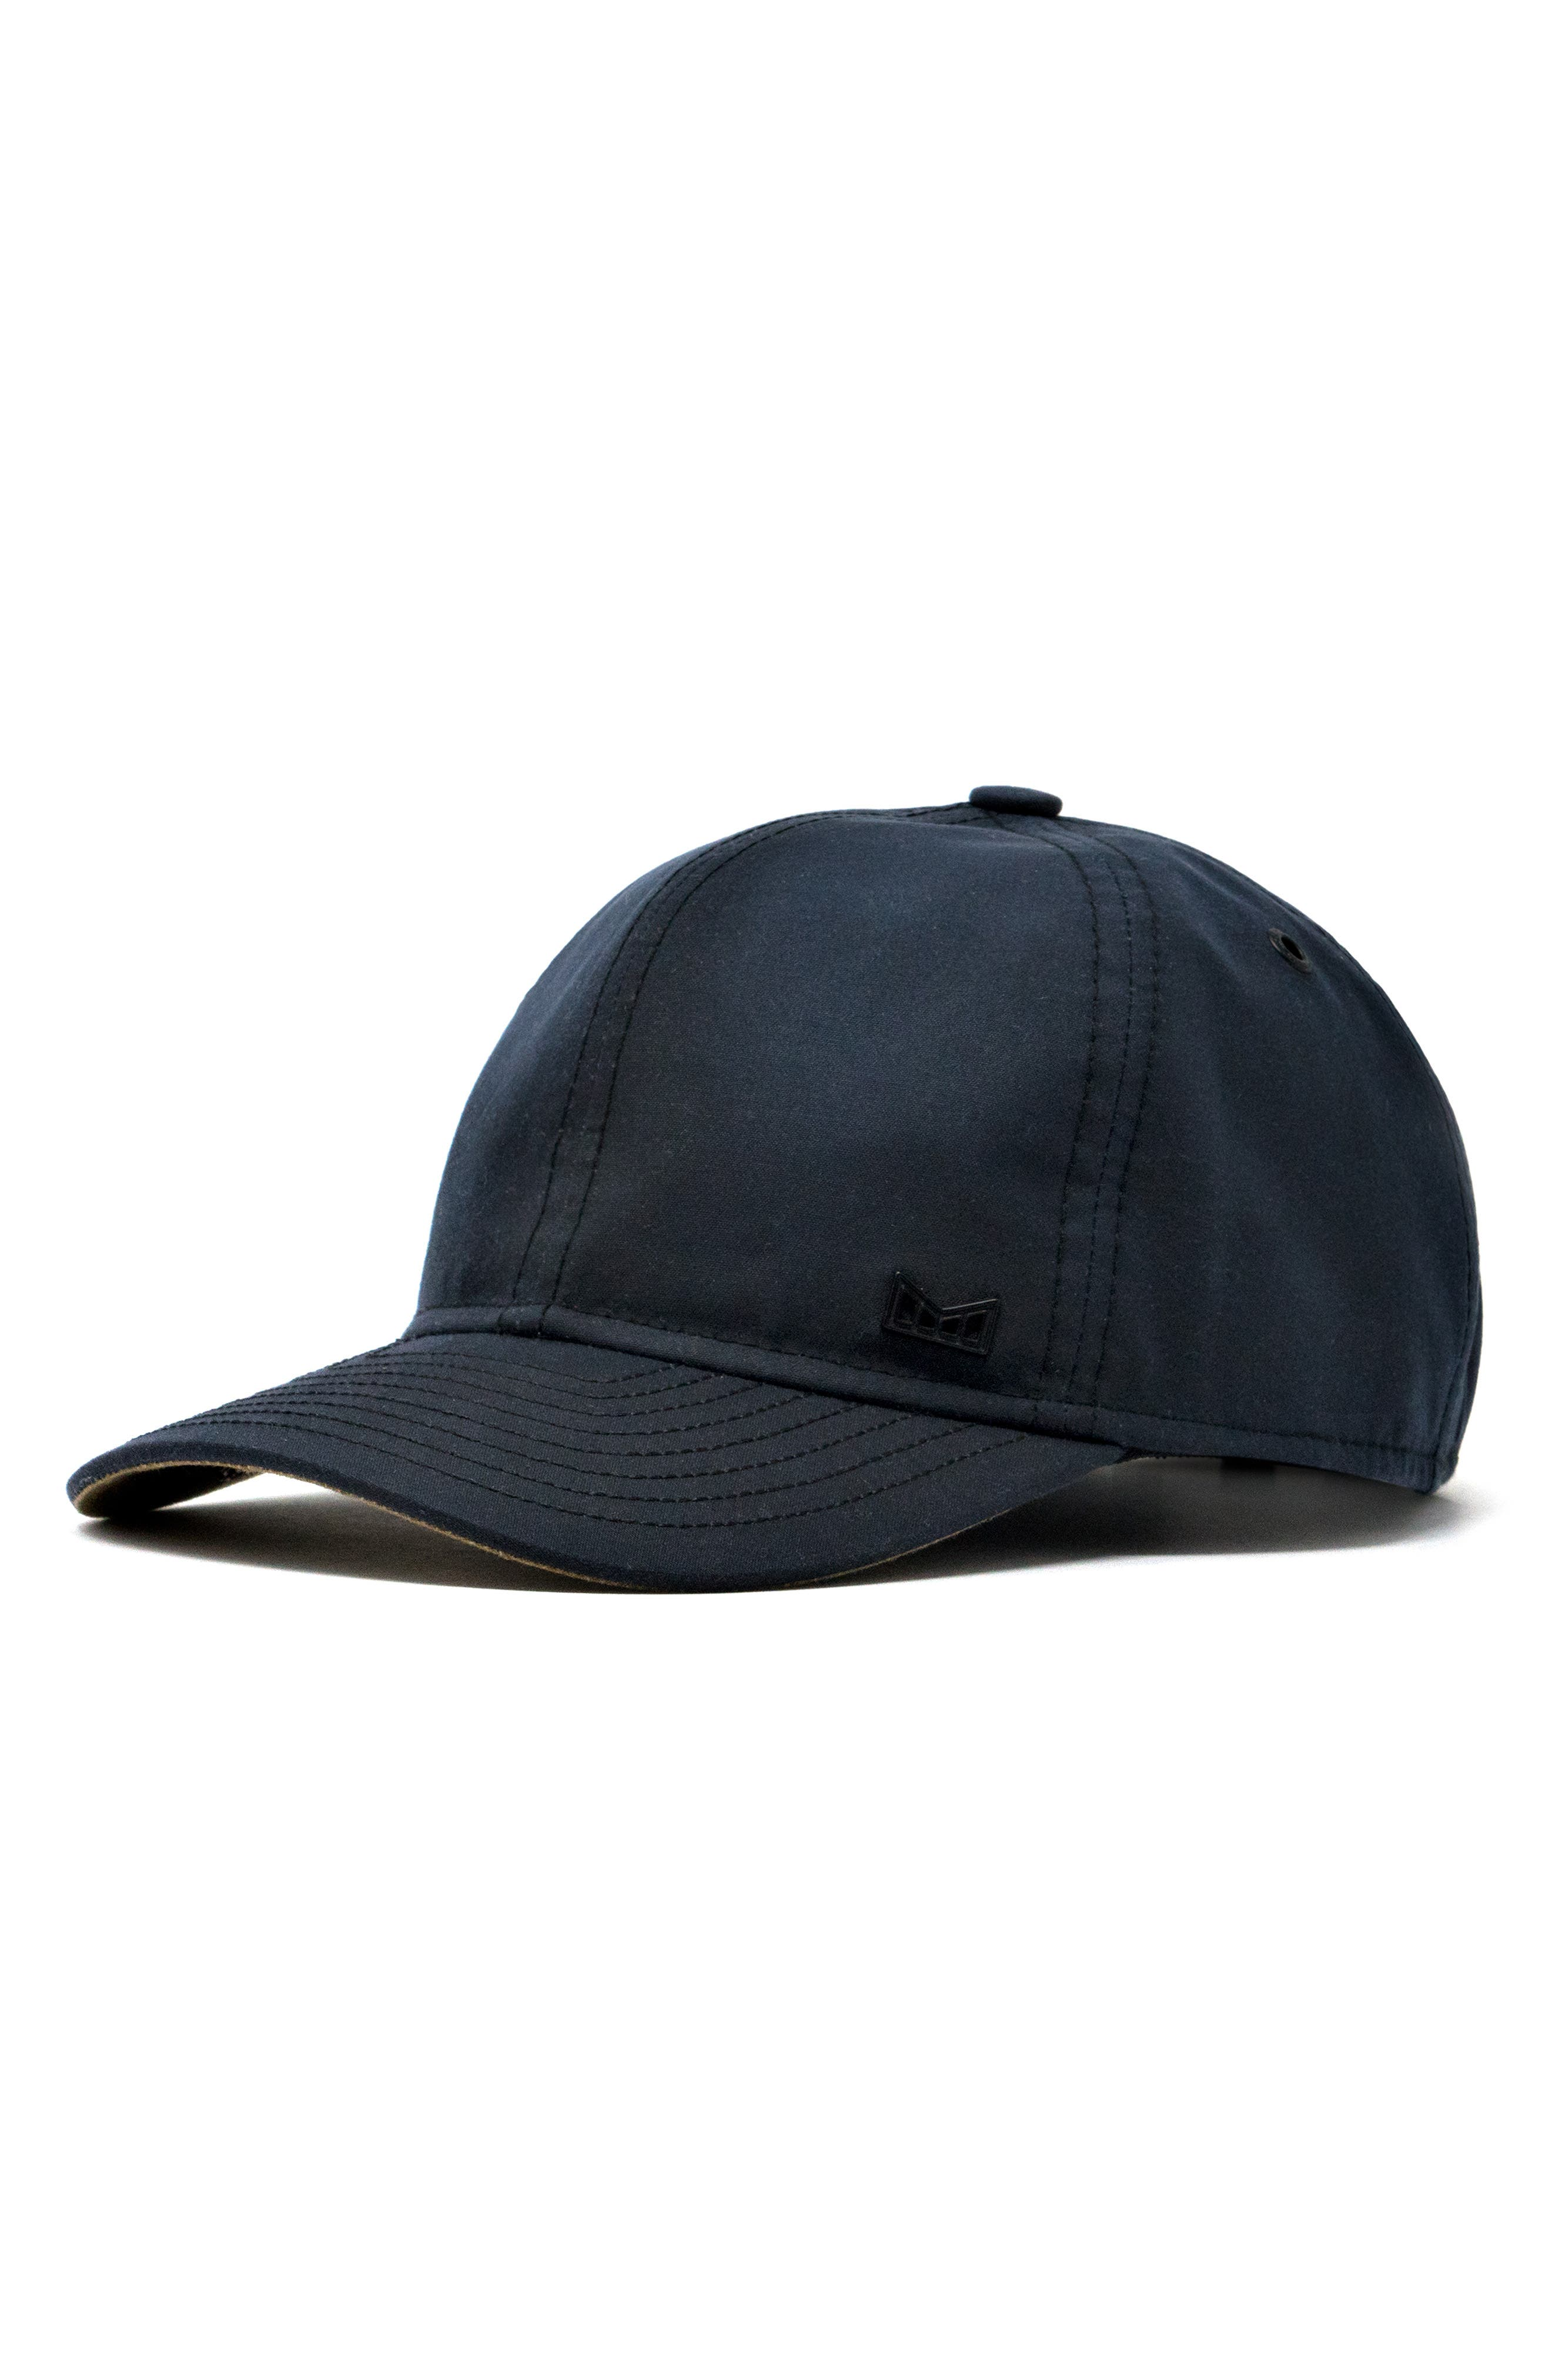 MELIN Huntsman Technical Cap - Blue in Navy